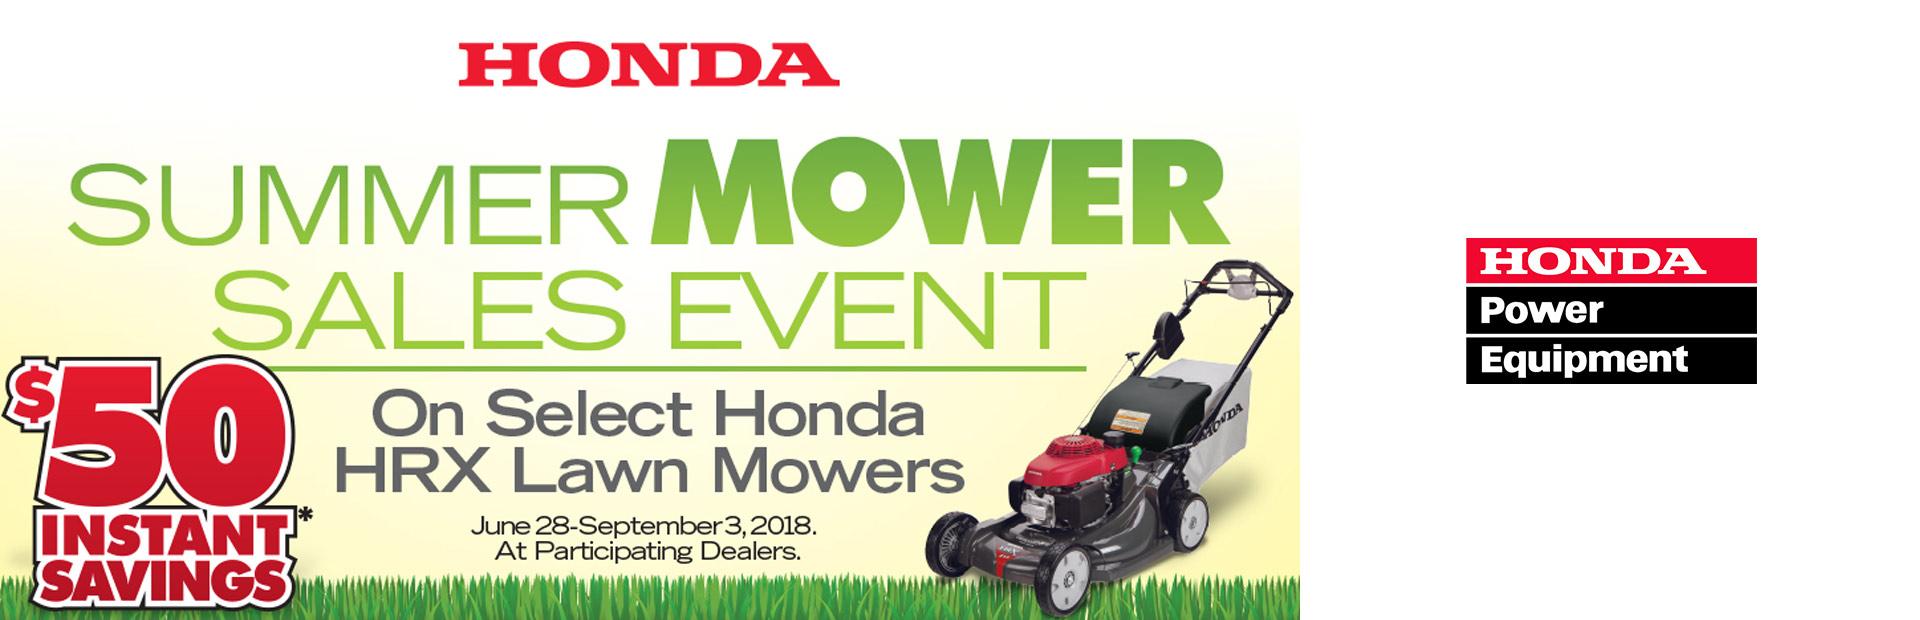 Honda Equipment Summer Mower S Event